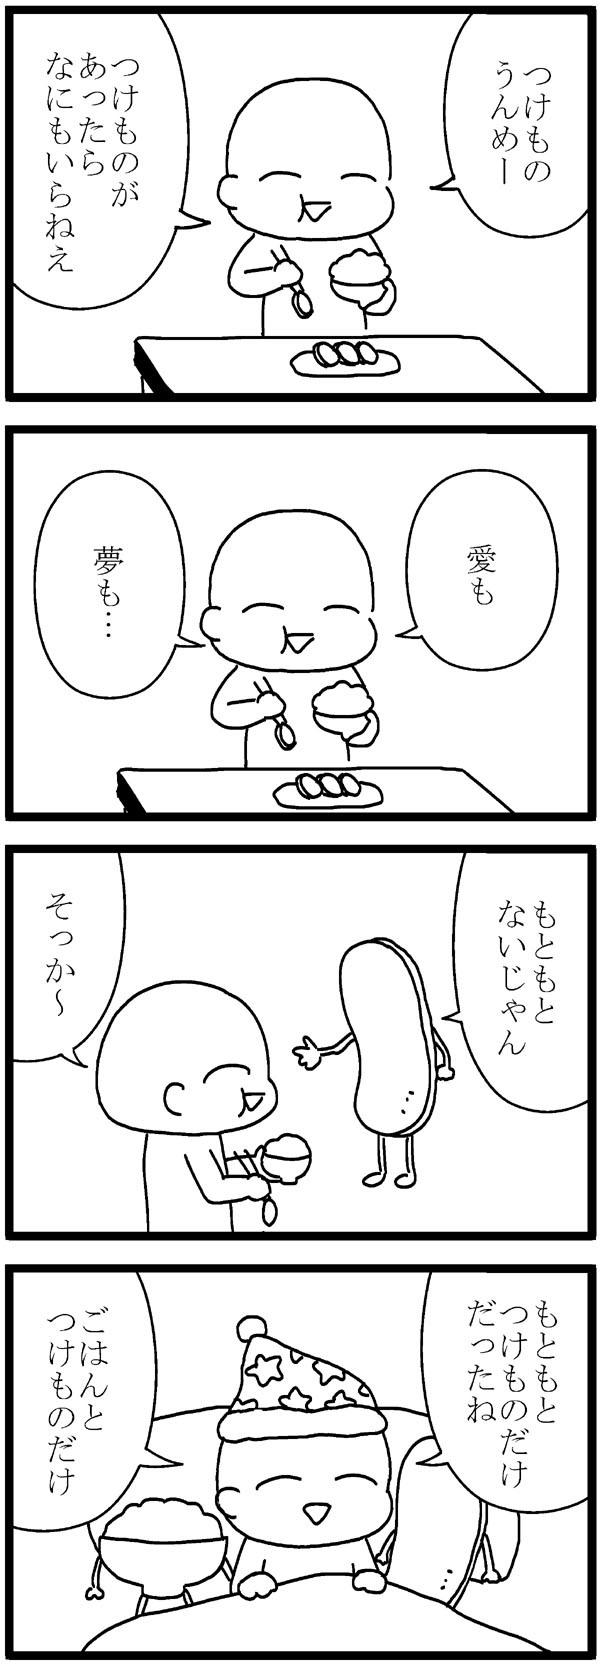 9ef9a36e.jpg